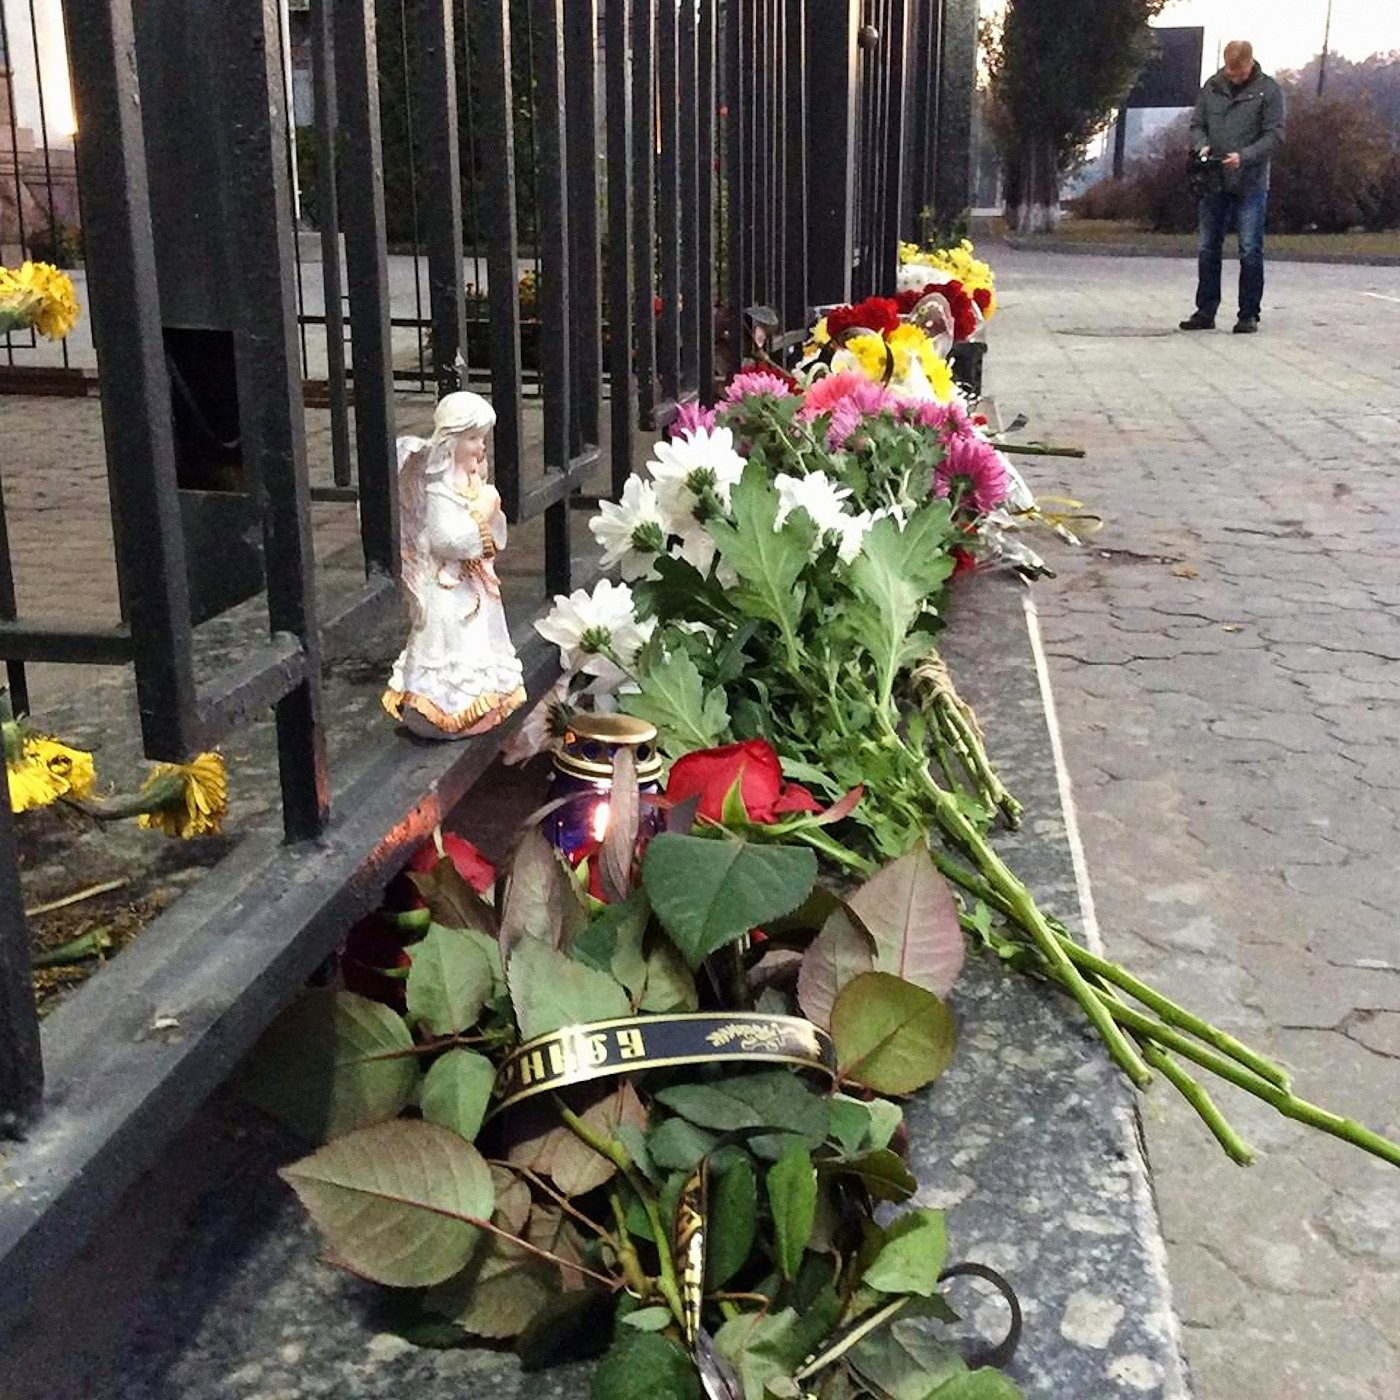 00 kiev embassy russia airliner crash 04 311015